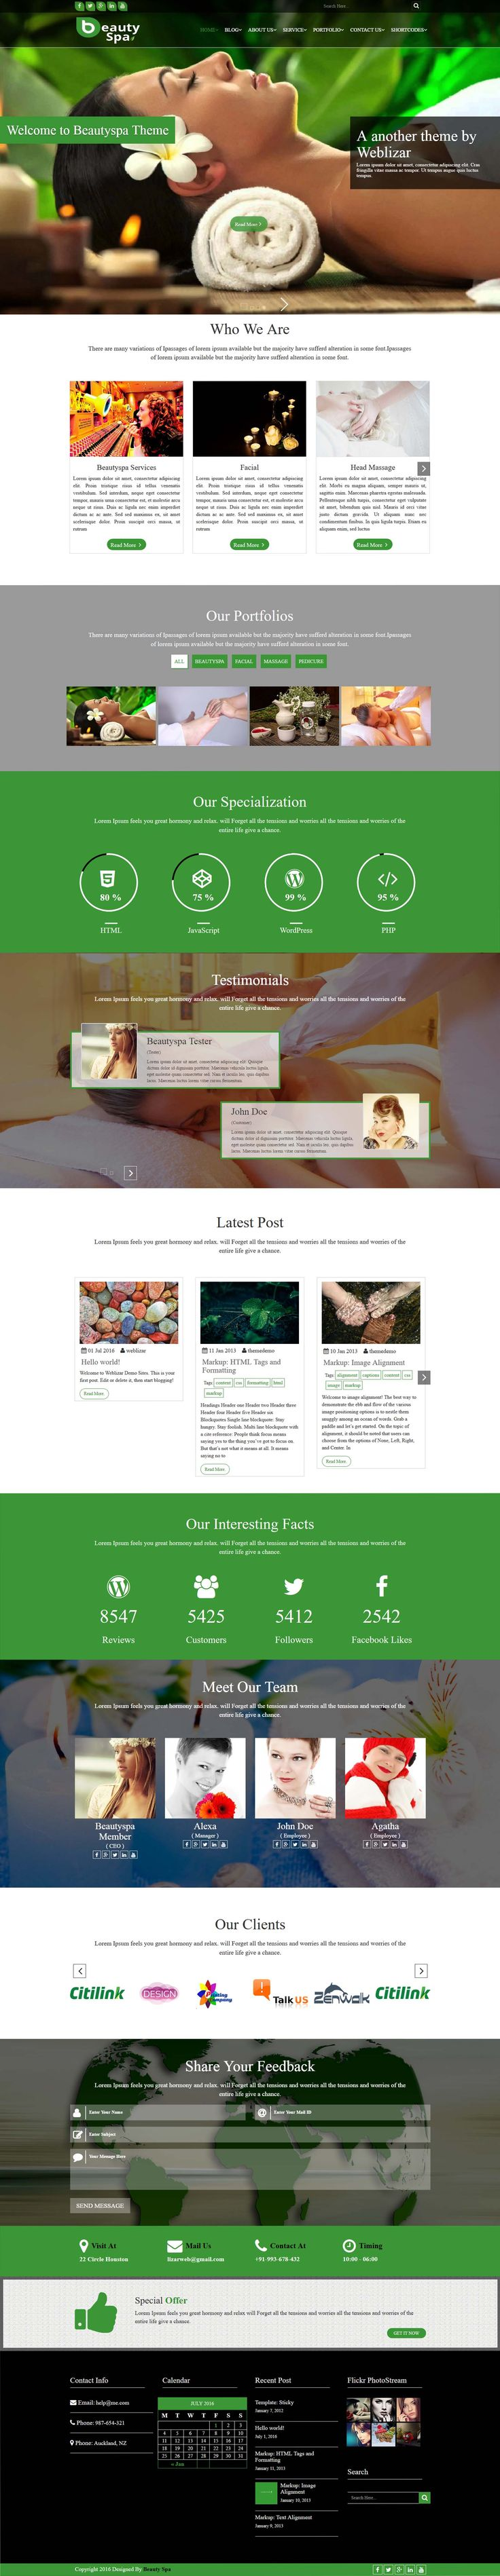 Beautyspa Premium WordPress Theme